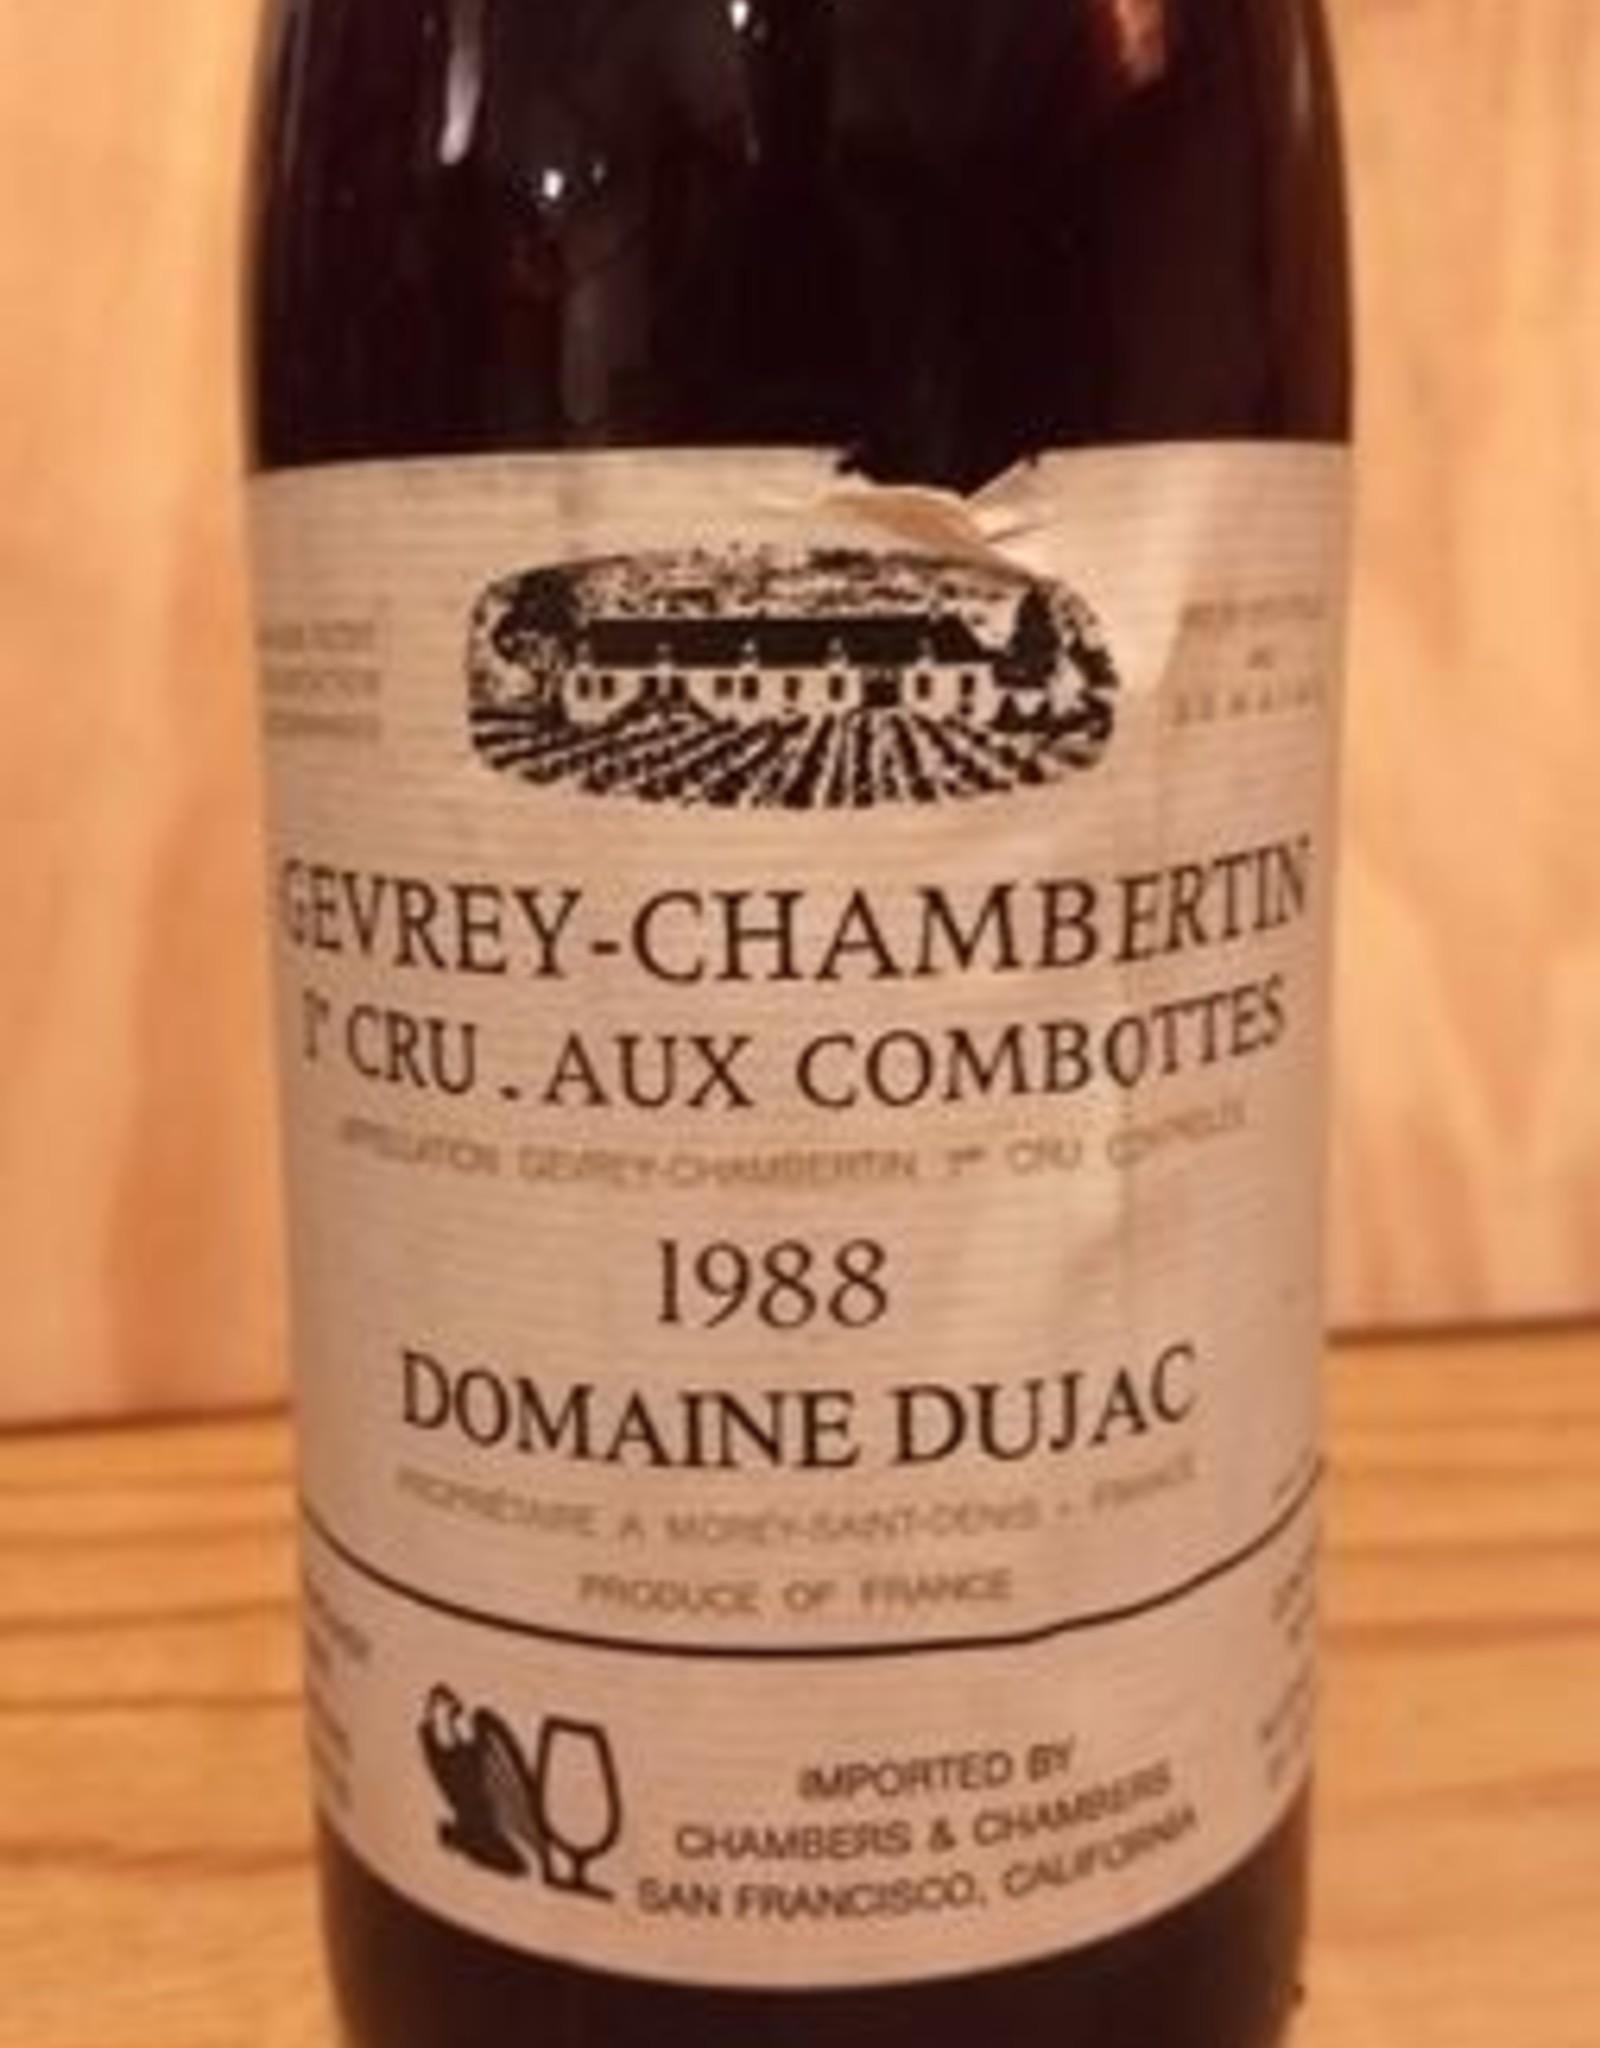 Dujac Gevrey Chambertin 1988 1er Cru Aux Combottes 1988